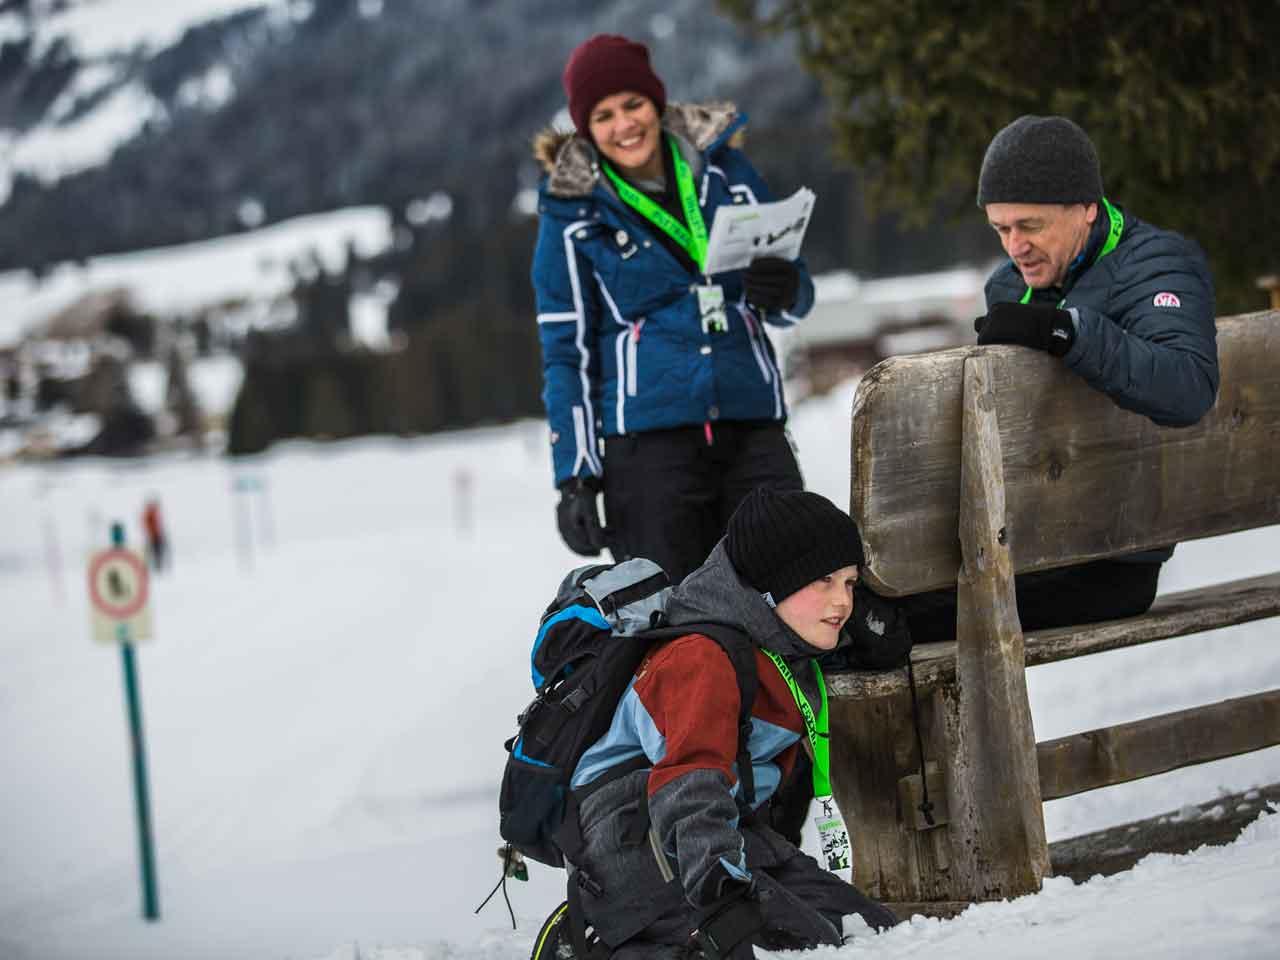 Ausflug: Spannende Schnitzeljagd im Winter – Foxtrail